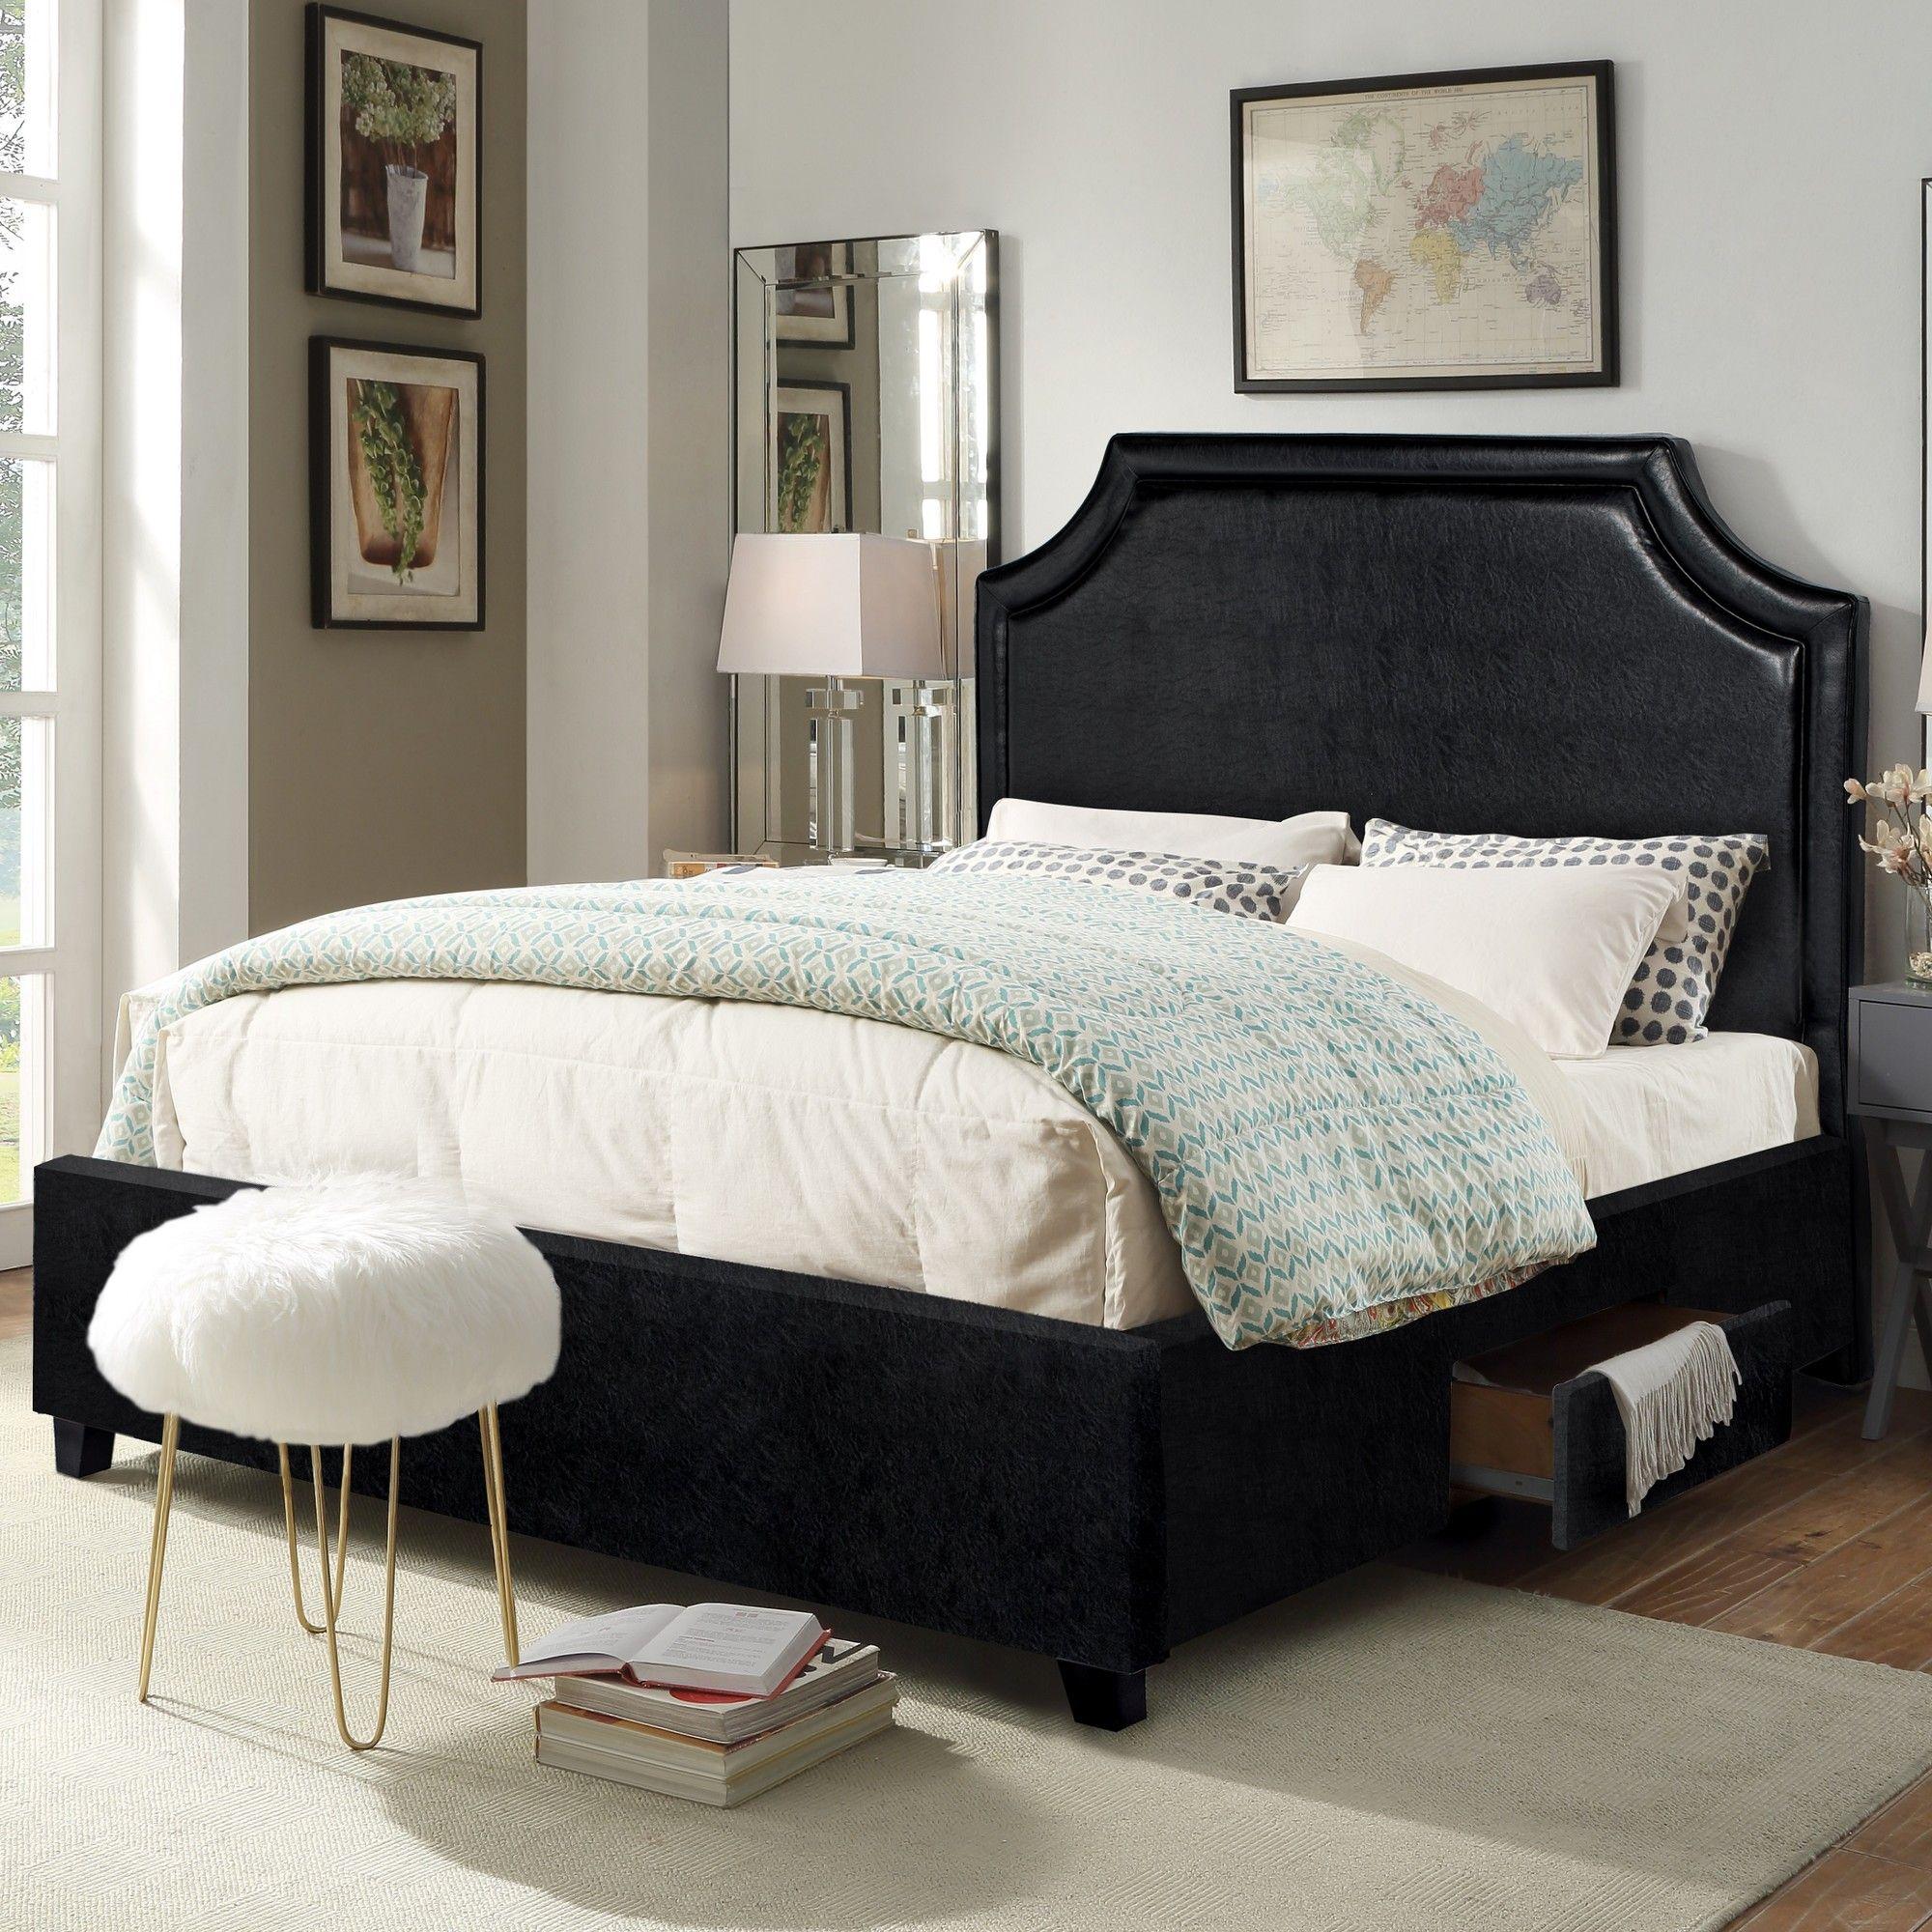 Louis Storage Platform Bed Bed frame and headboard